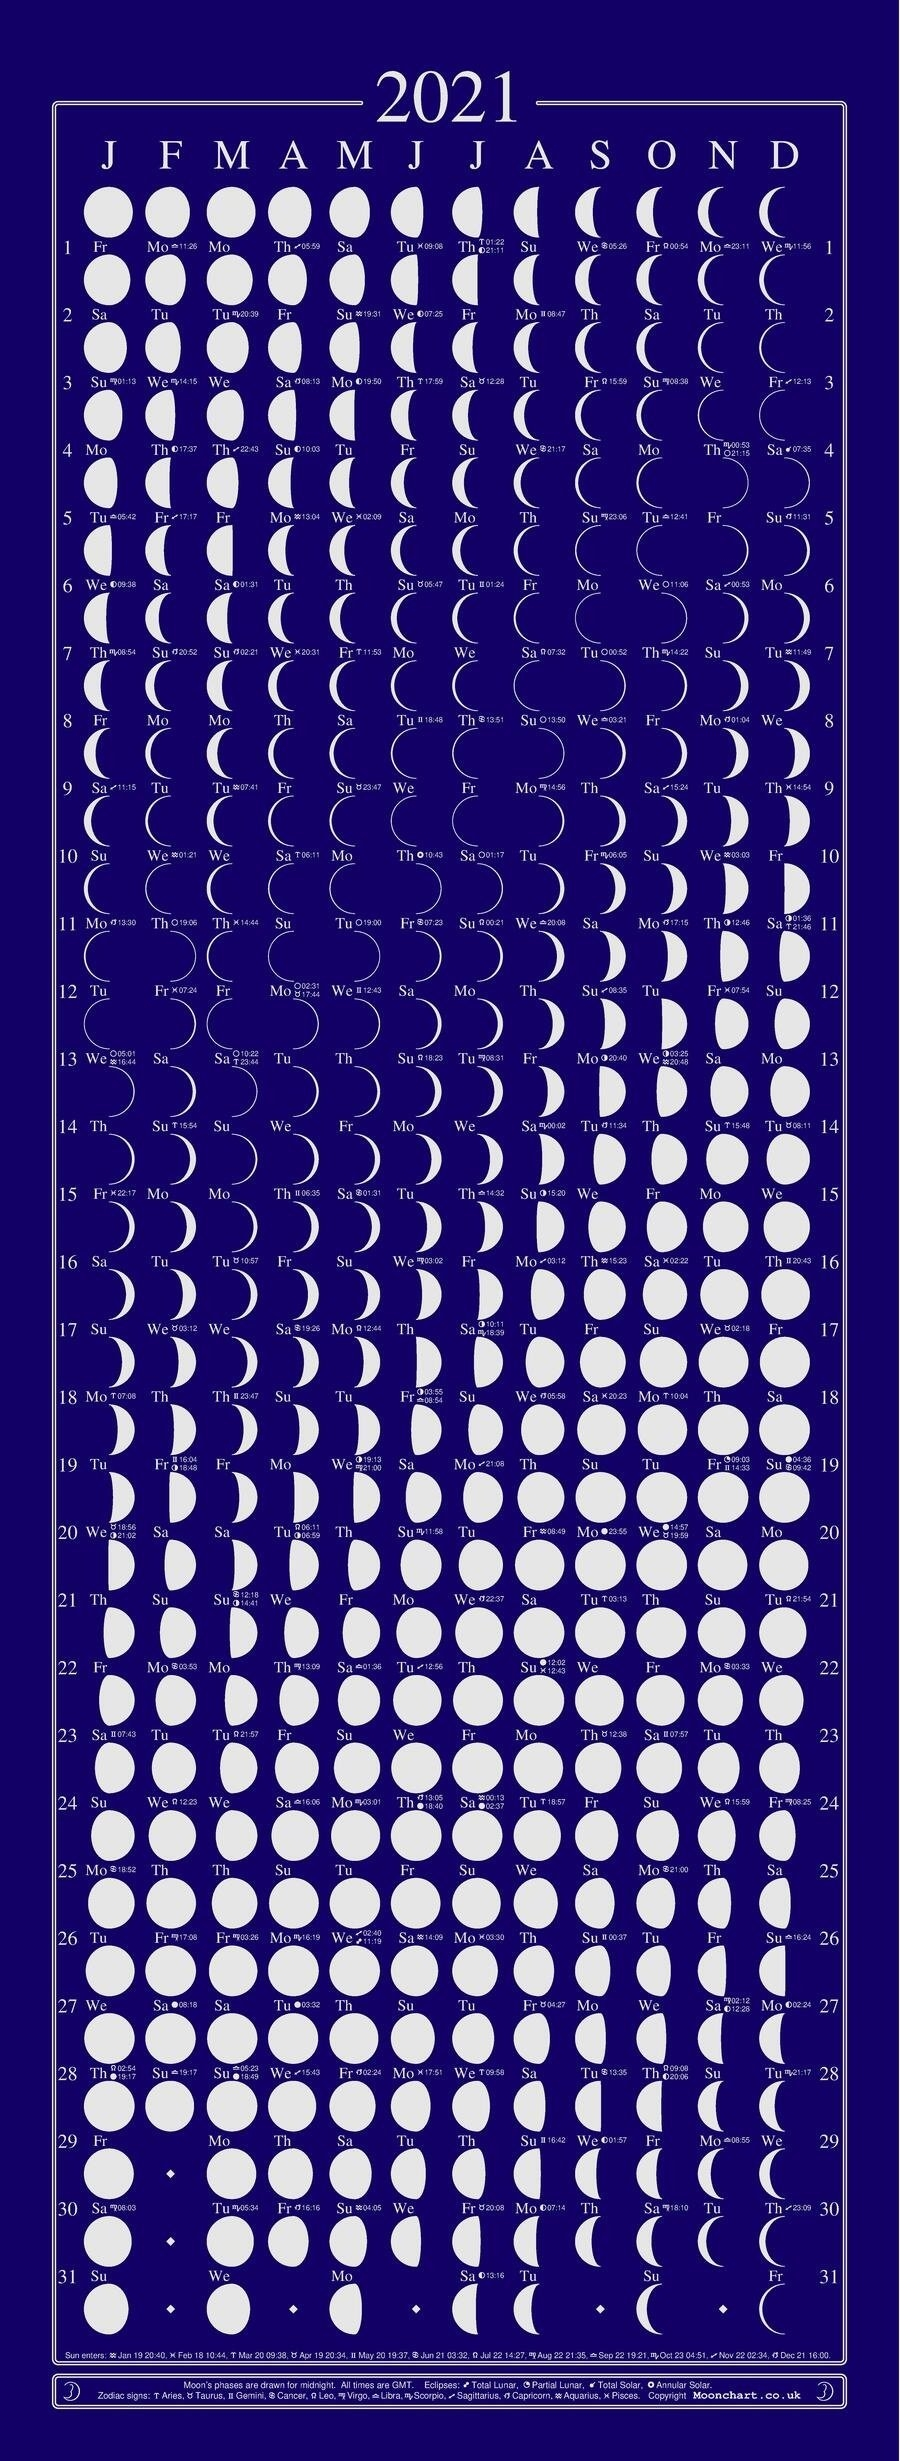 2021 Moon Chart Calendar (Unit Of 12) Nett - David Westnedge Ltd throughout 2021 Calendar With Moon Phase